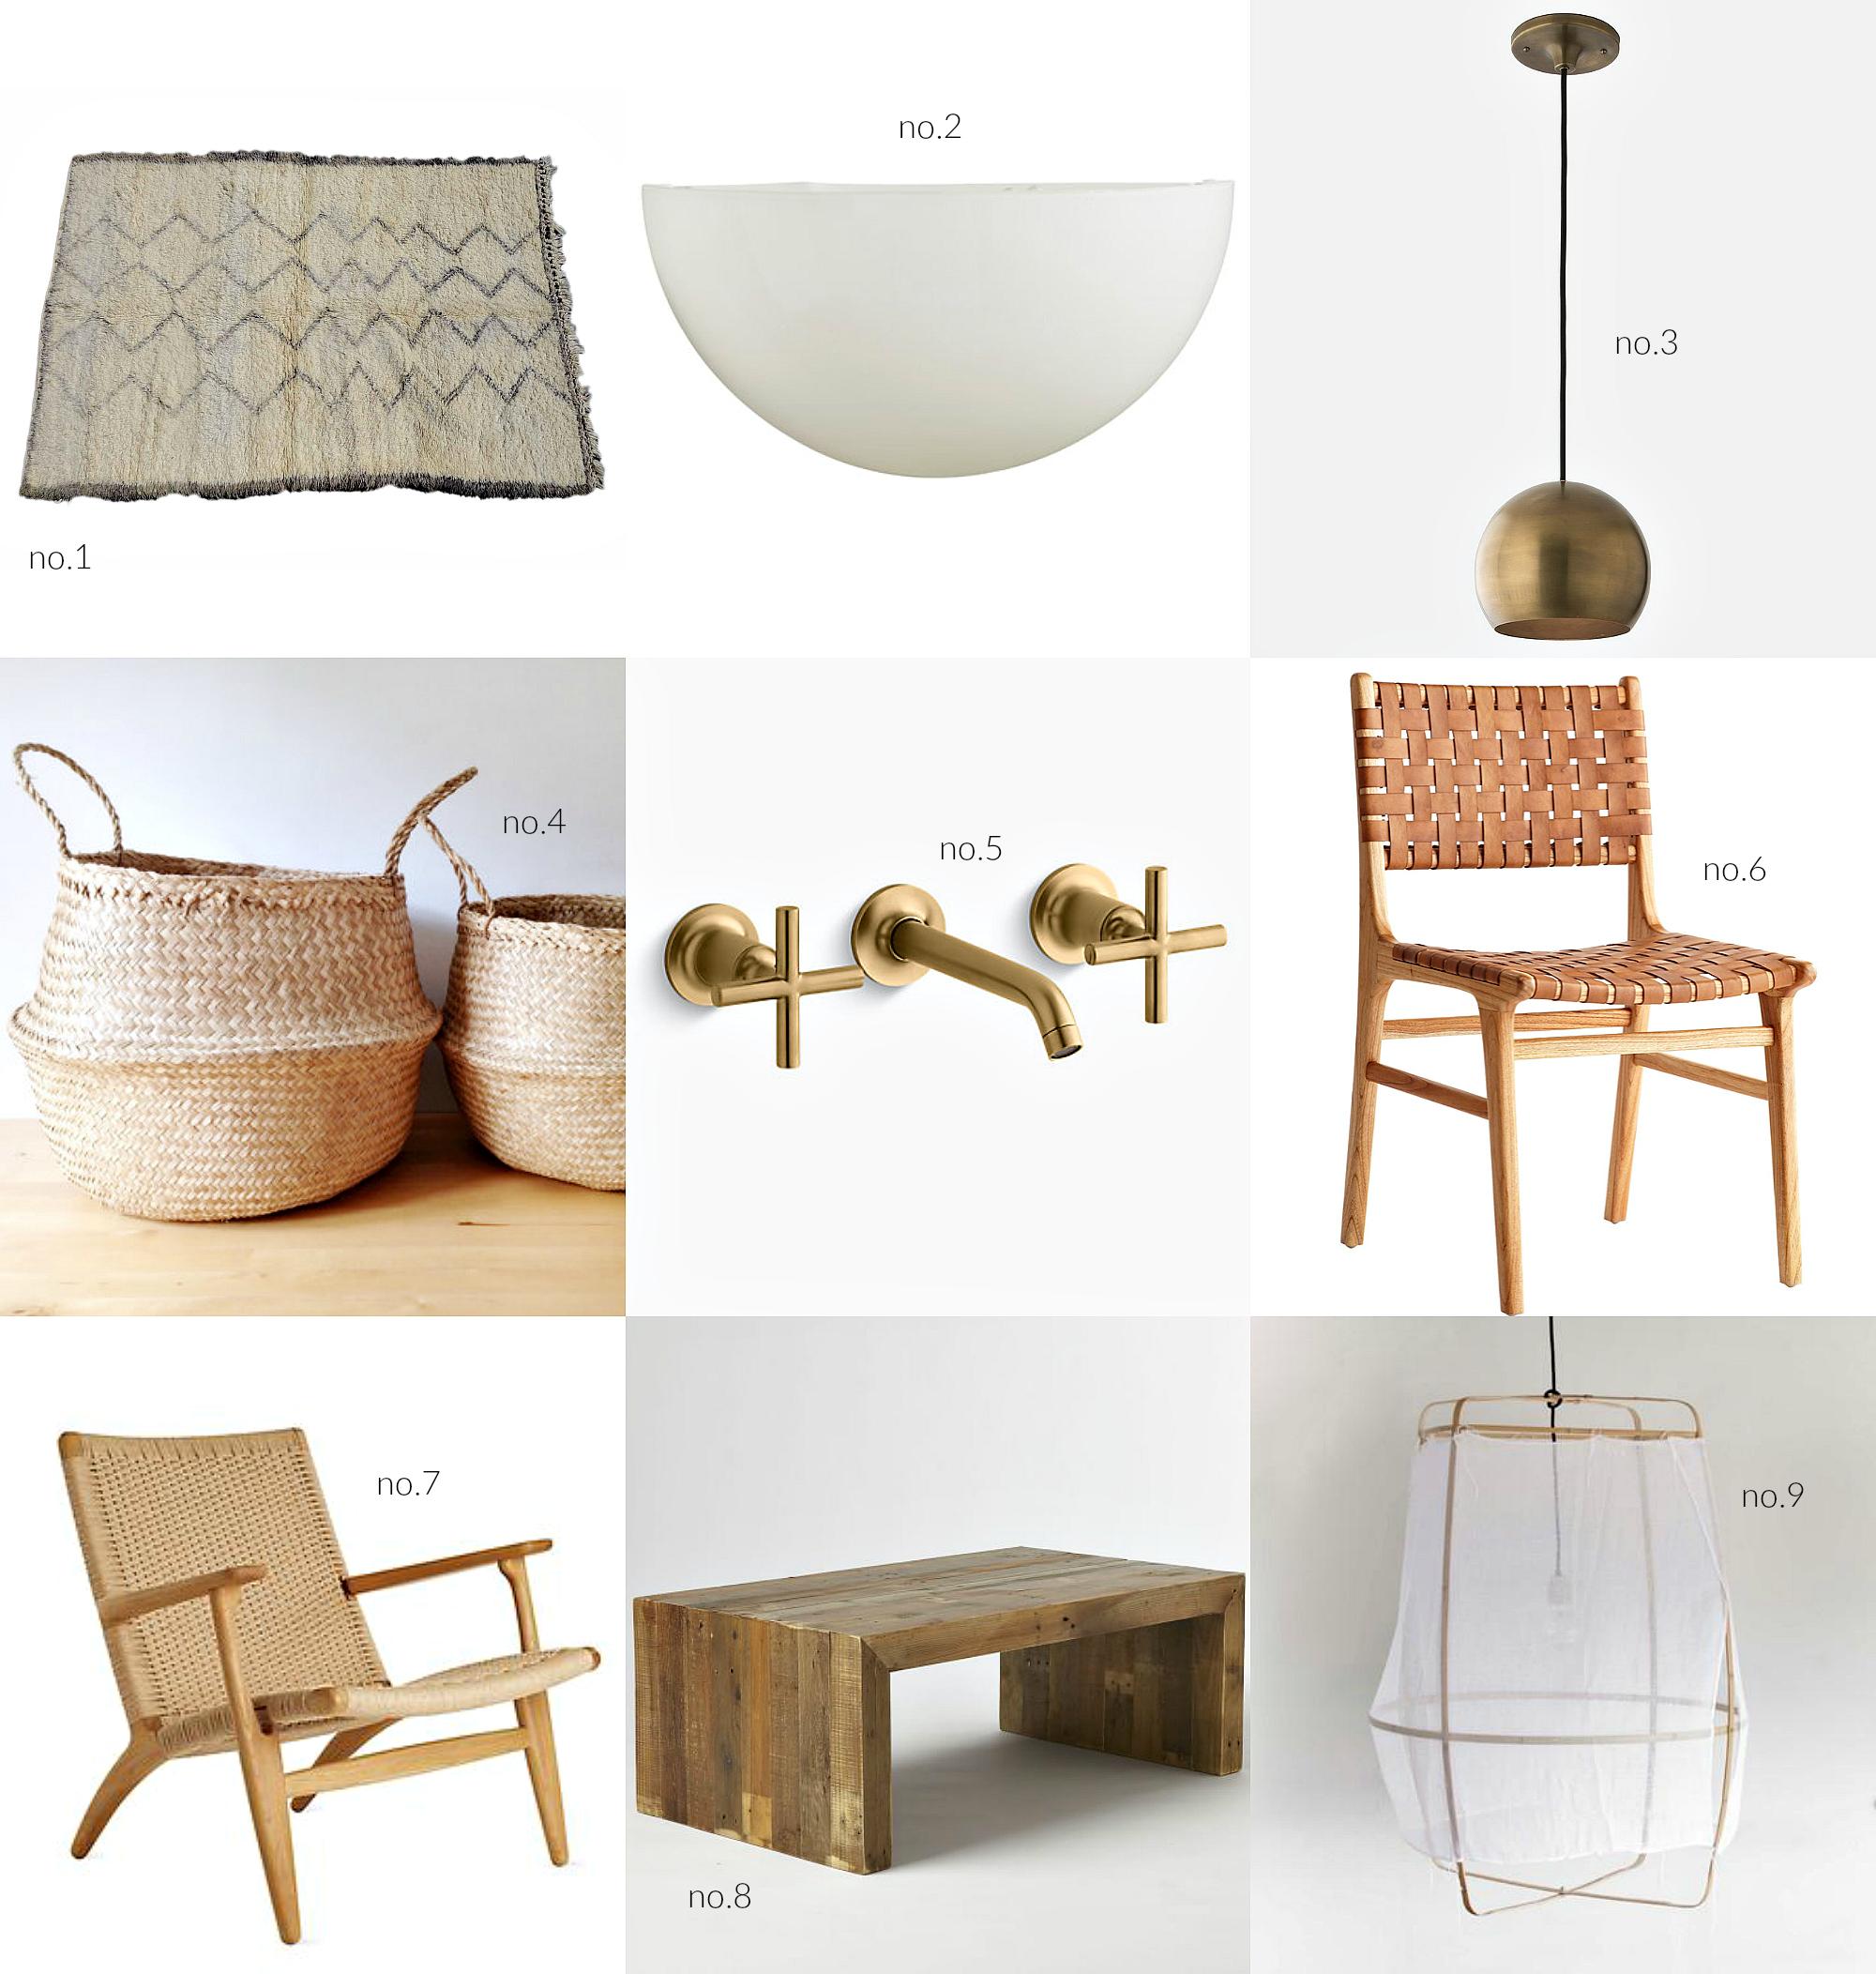 interior-collage.jpg